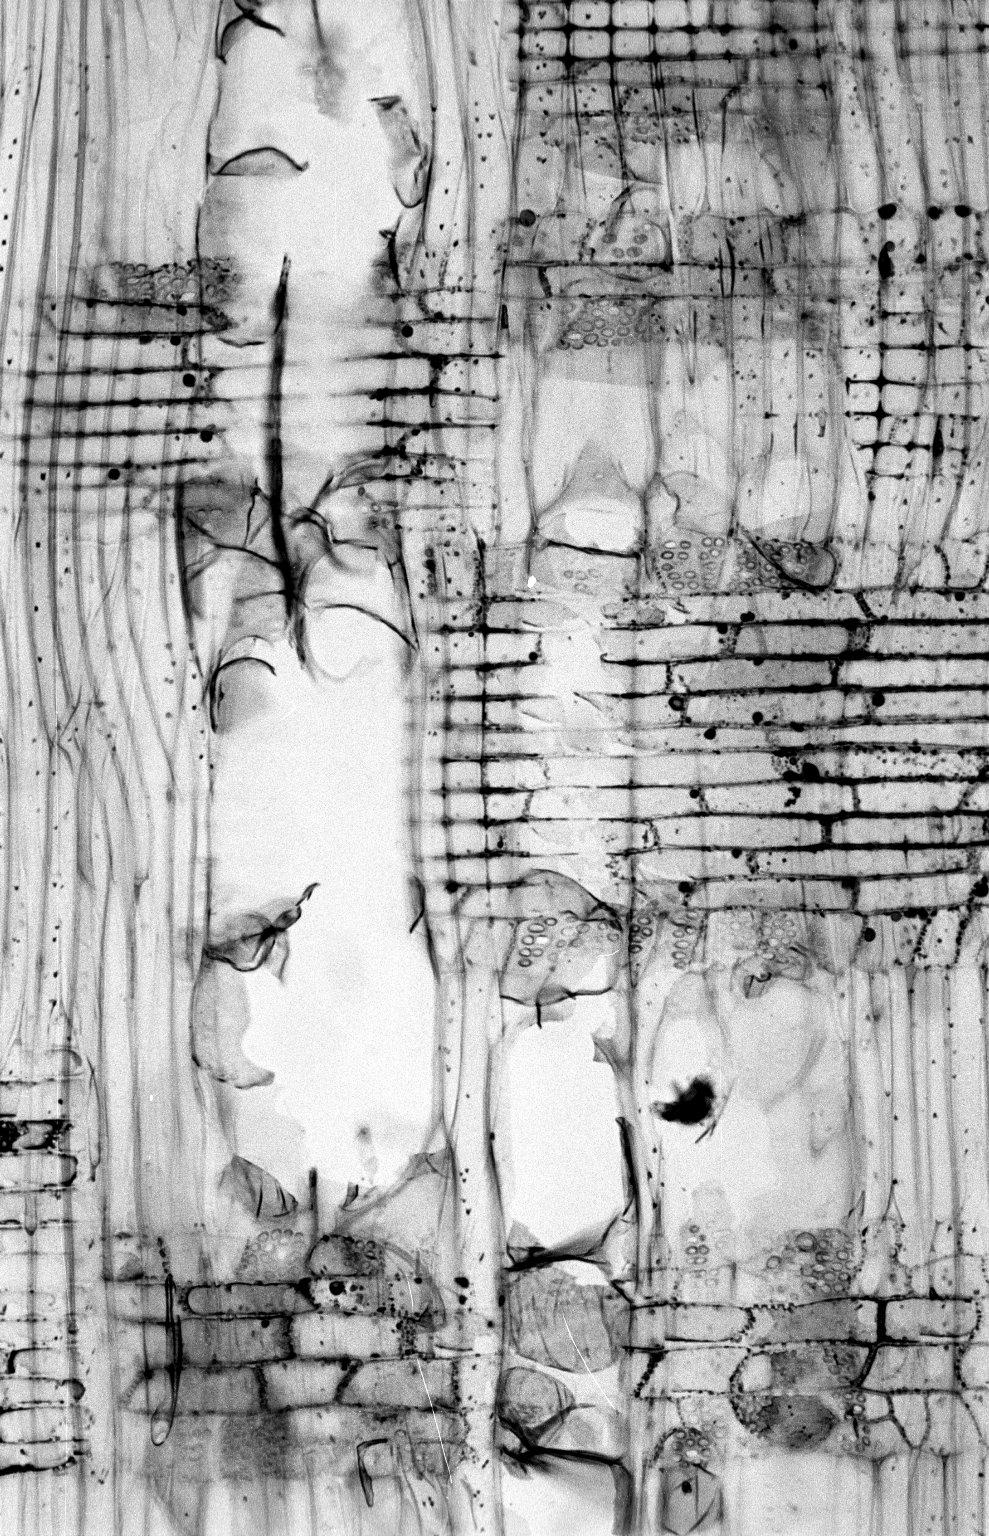 NOTHOFAGACEAE Nothofagus antarctica